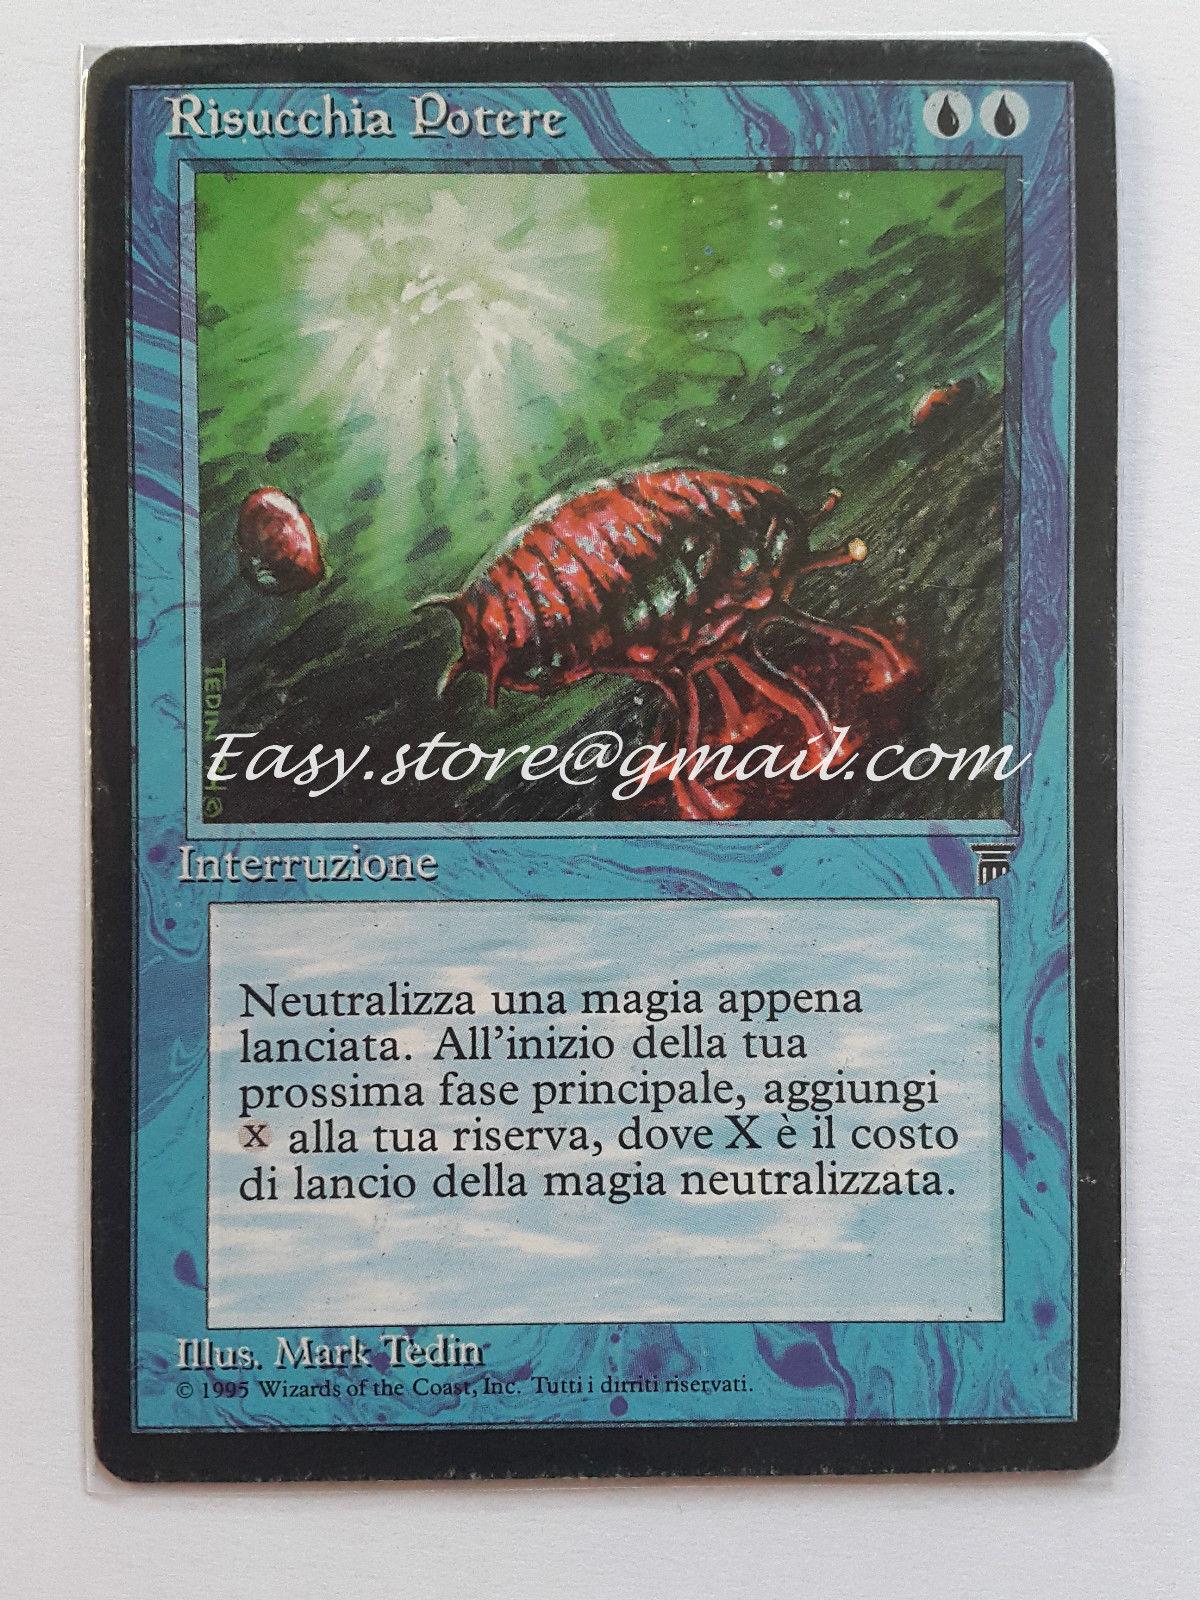 'accord macht -' manasauger 'ita - mtg magie